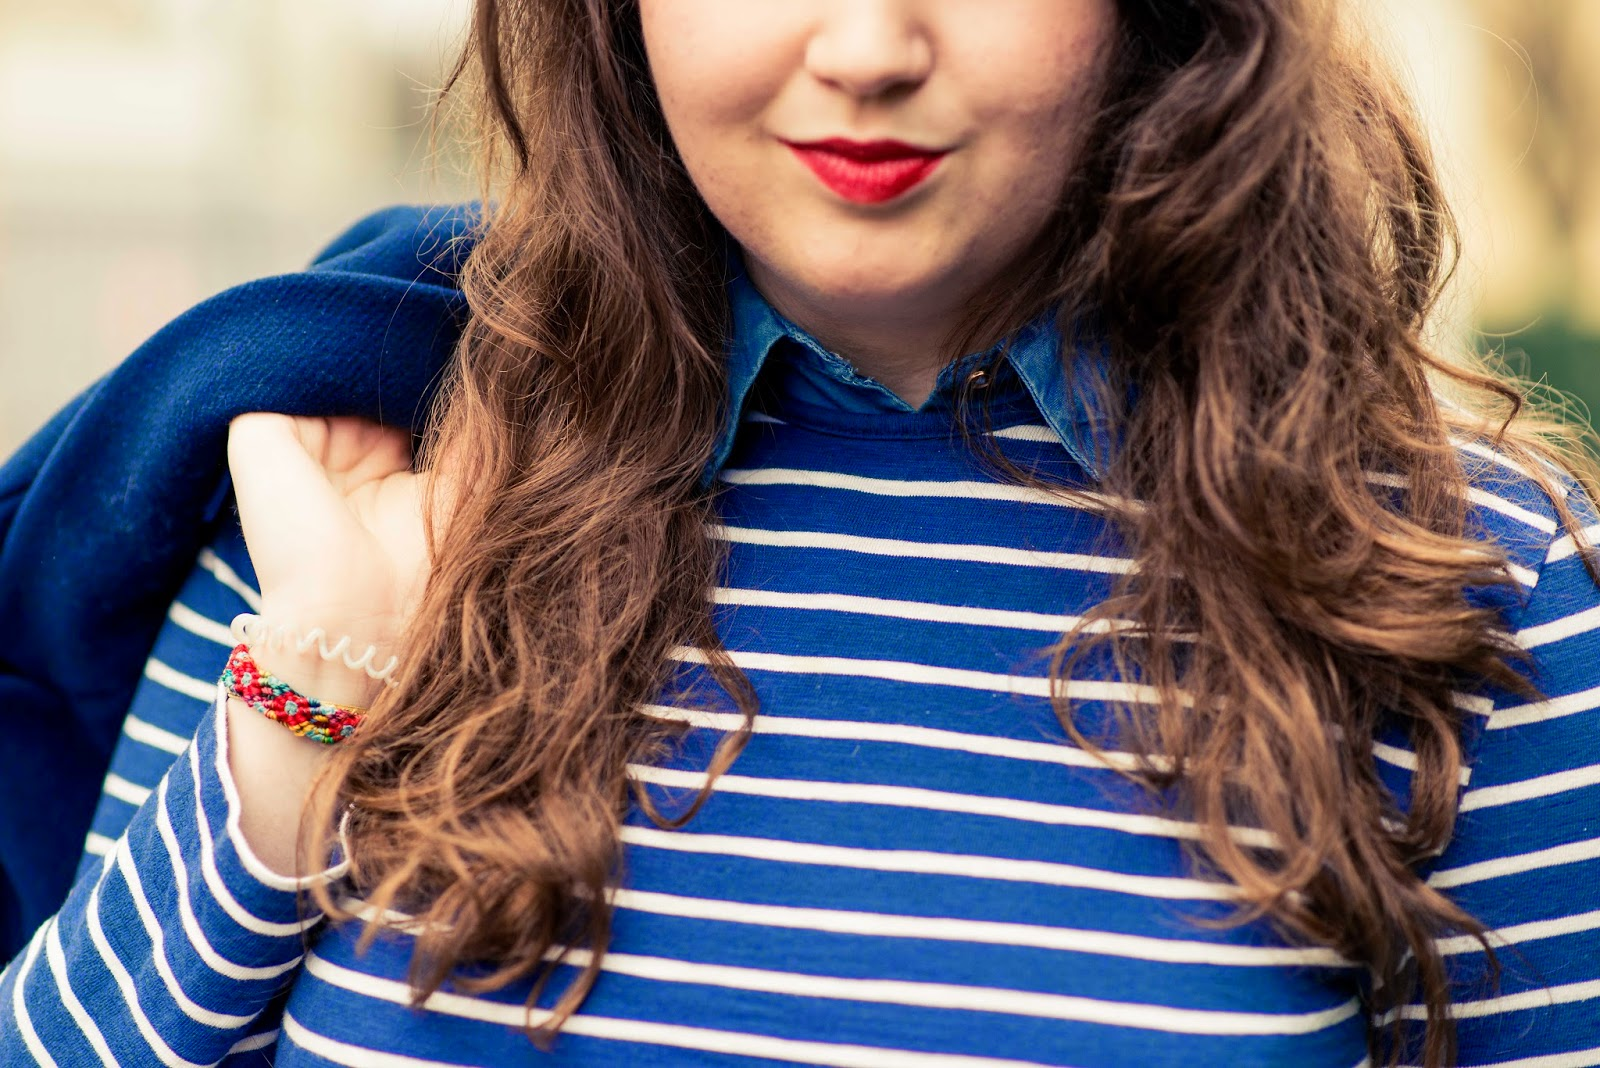 french lookbook blue look blog fashion blogger liquidgrain liquid grain